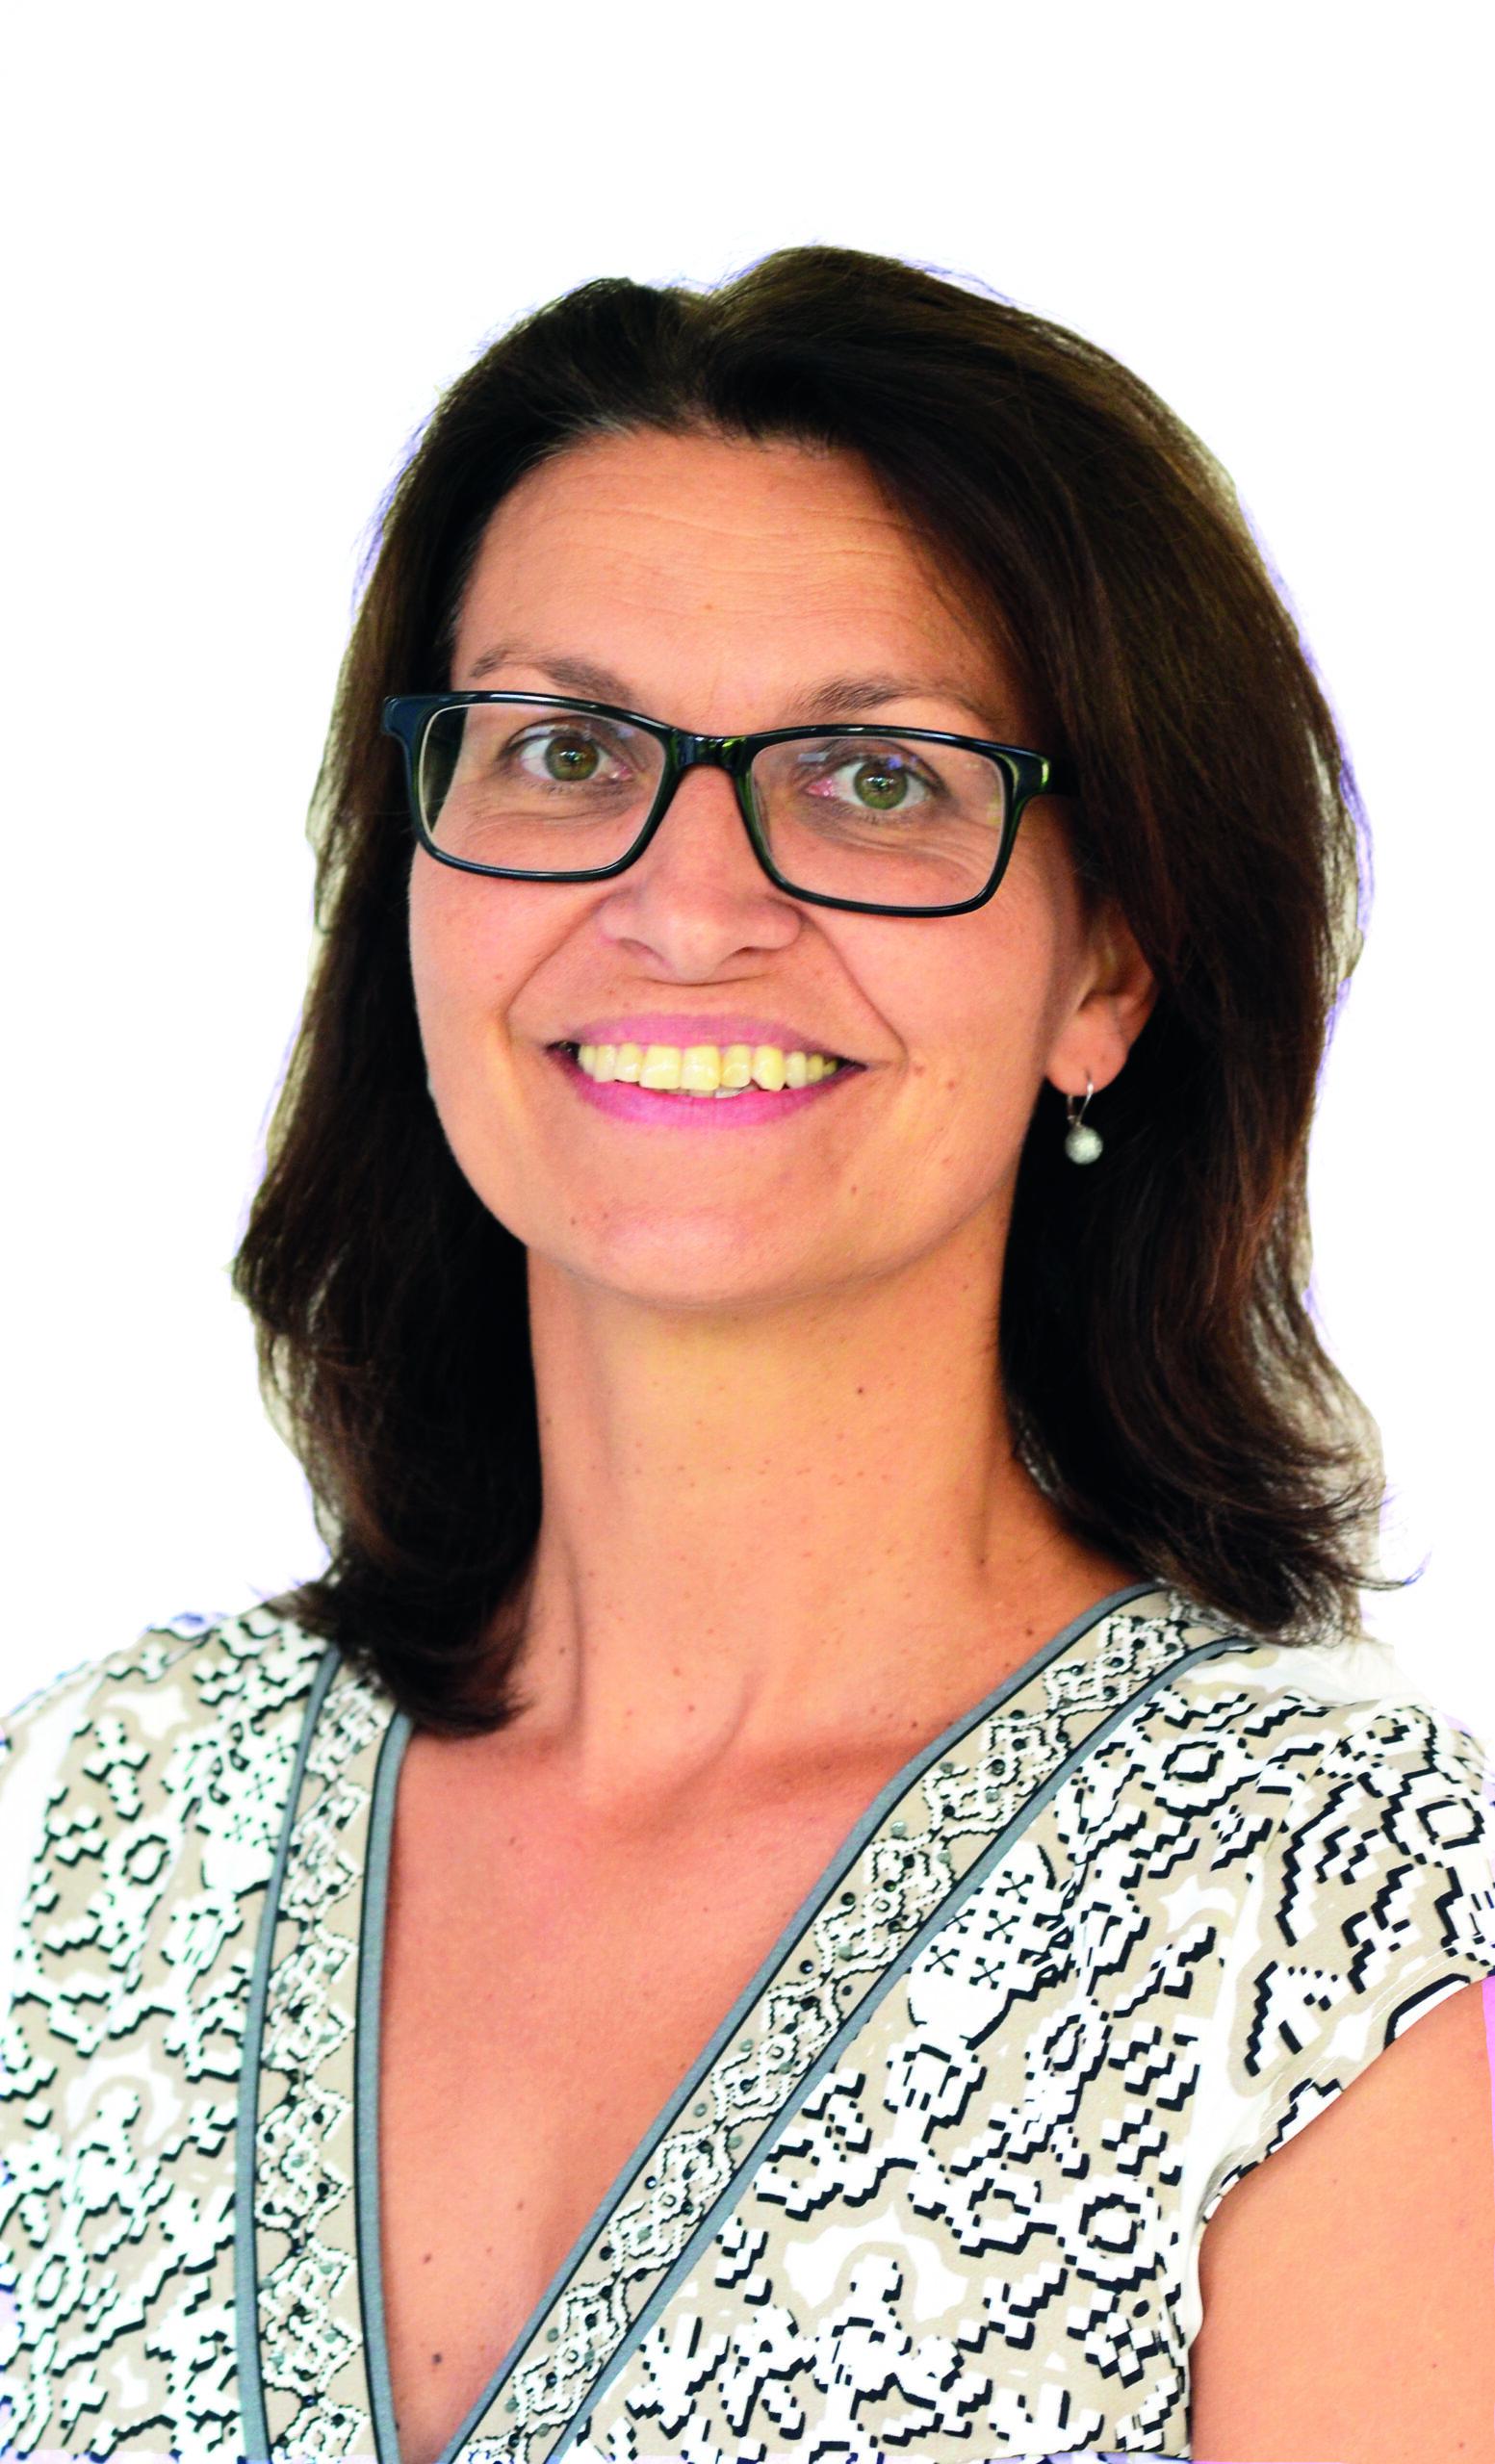 Nicole Rapp